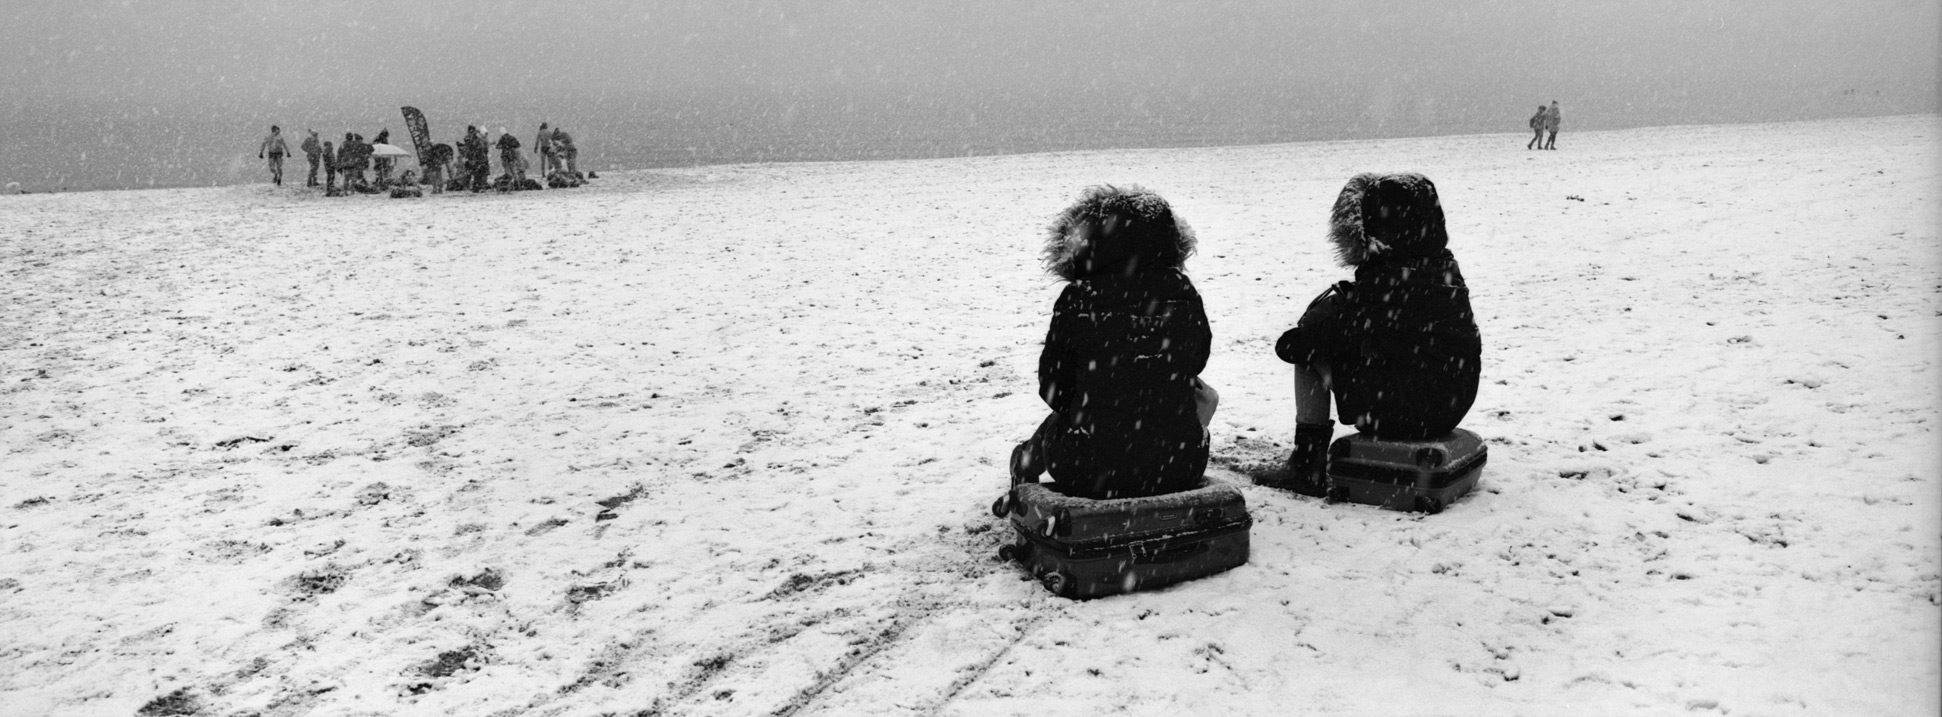 Gdańsk Beach, f = 8, exp = 1 / 60s,